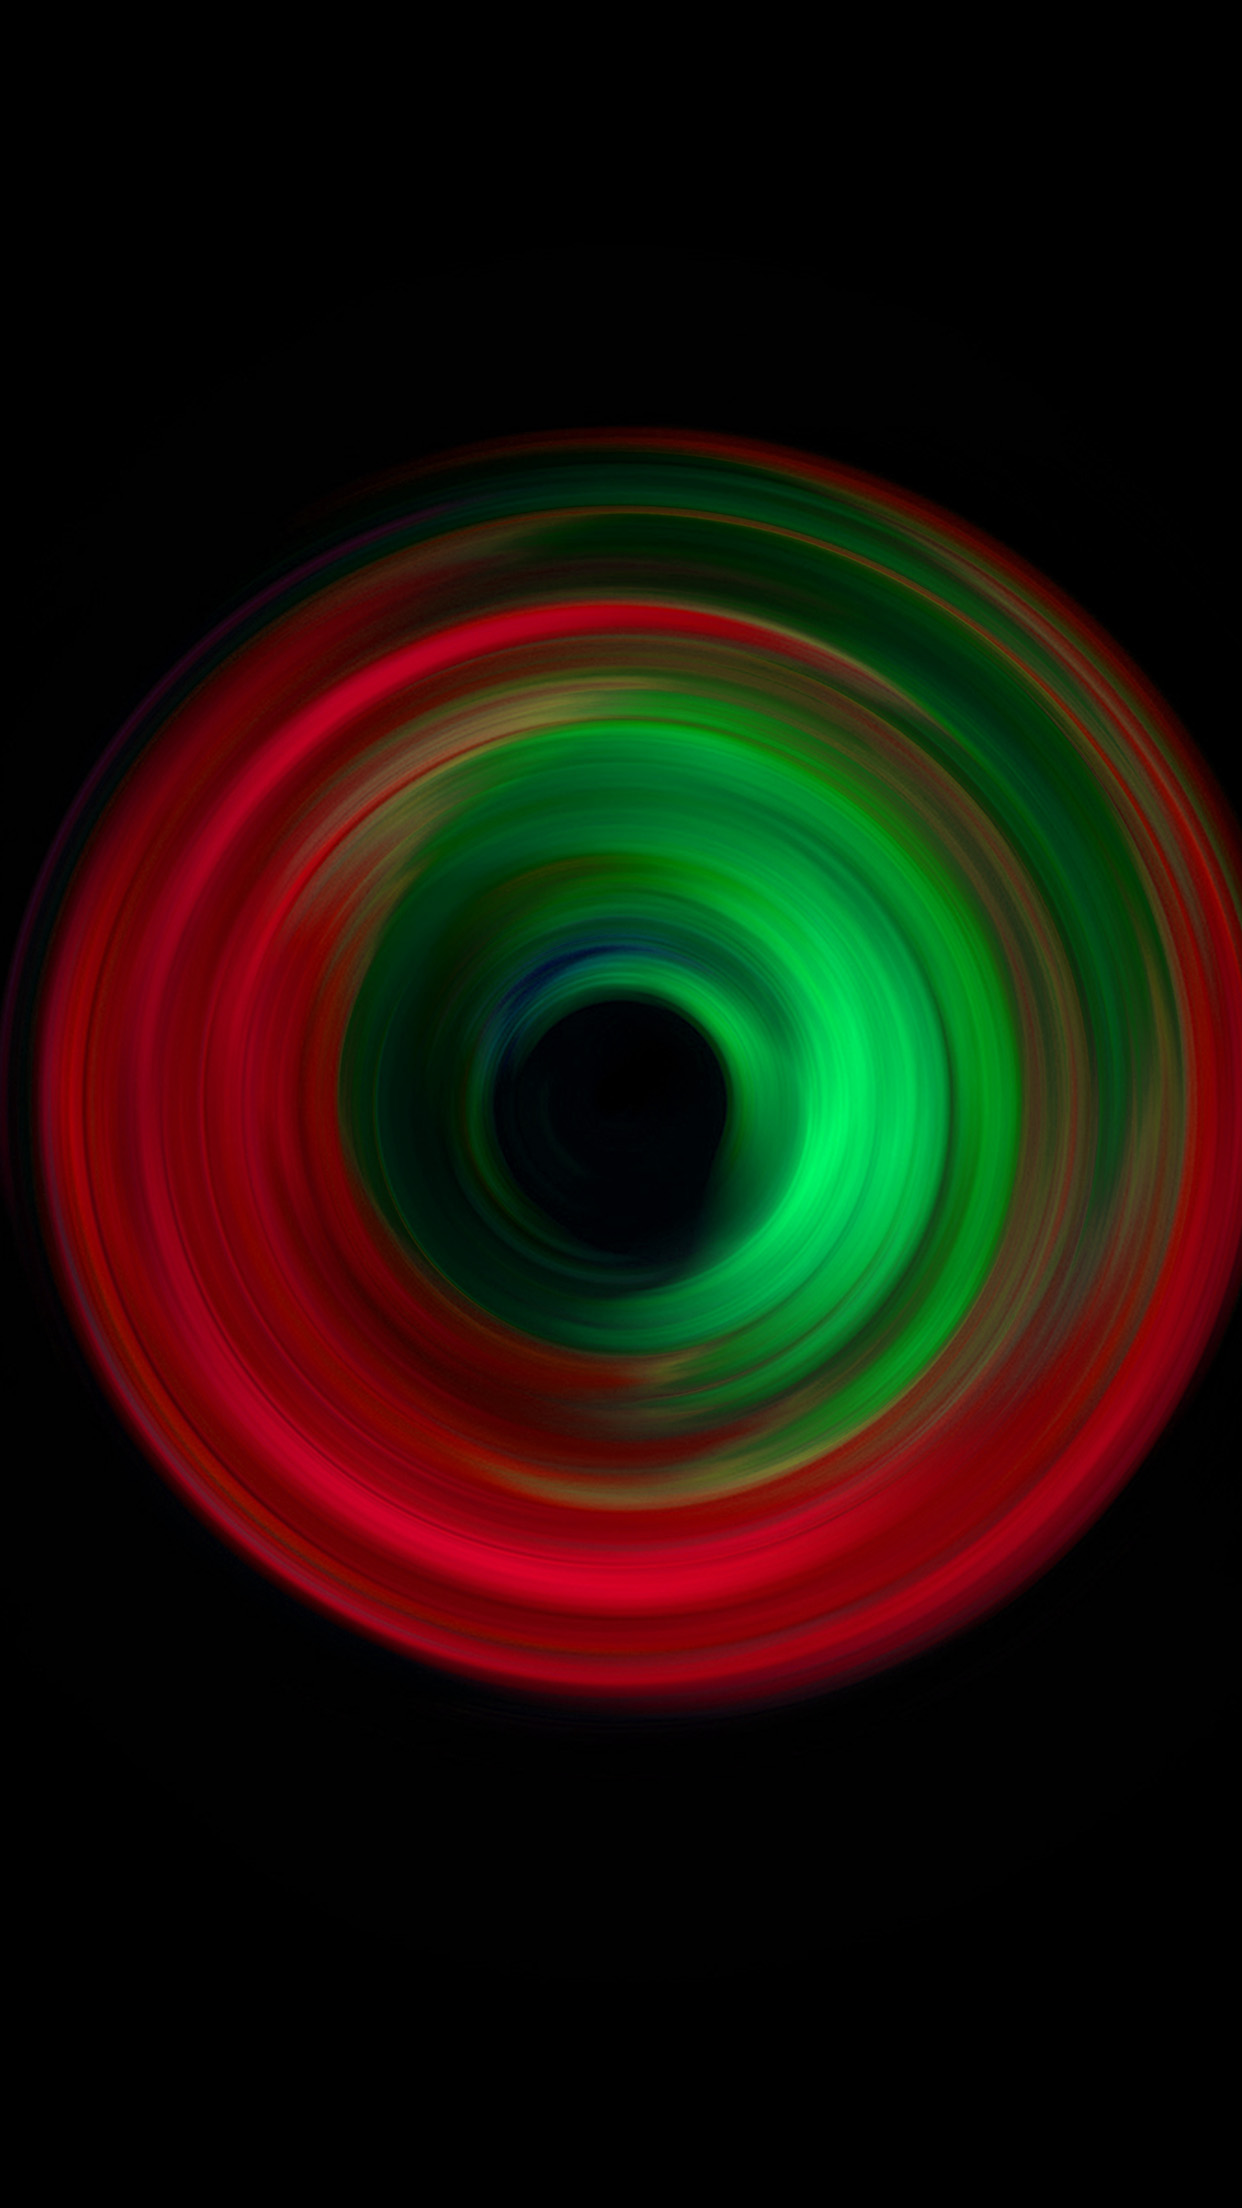 Vw78 Circle Dark Green Red Pattern Background